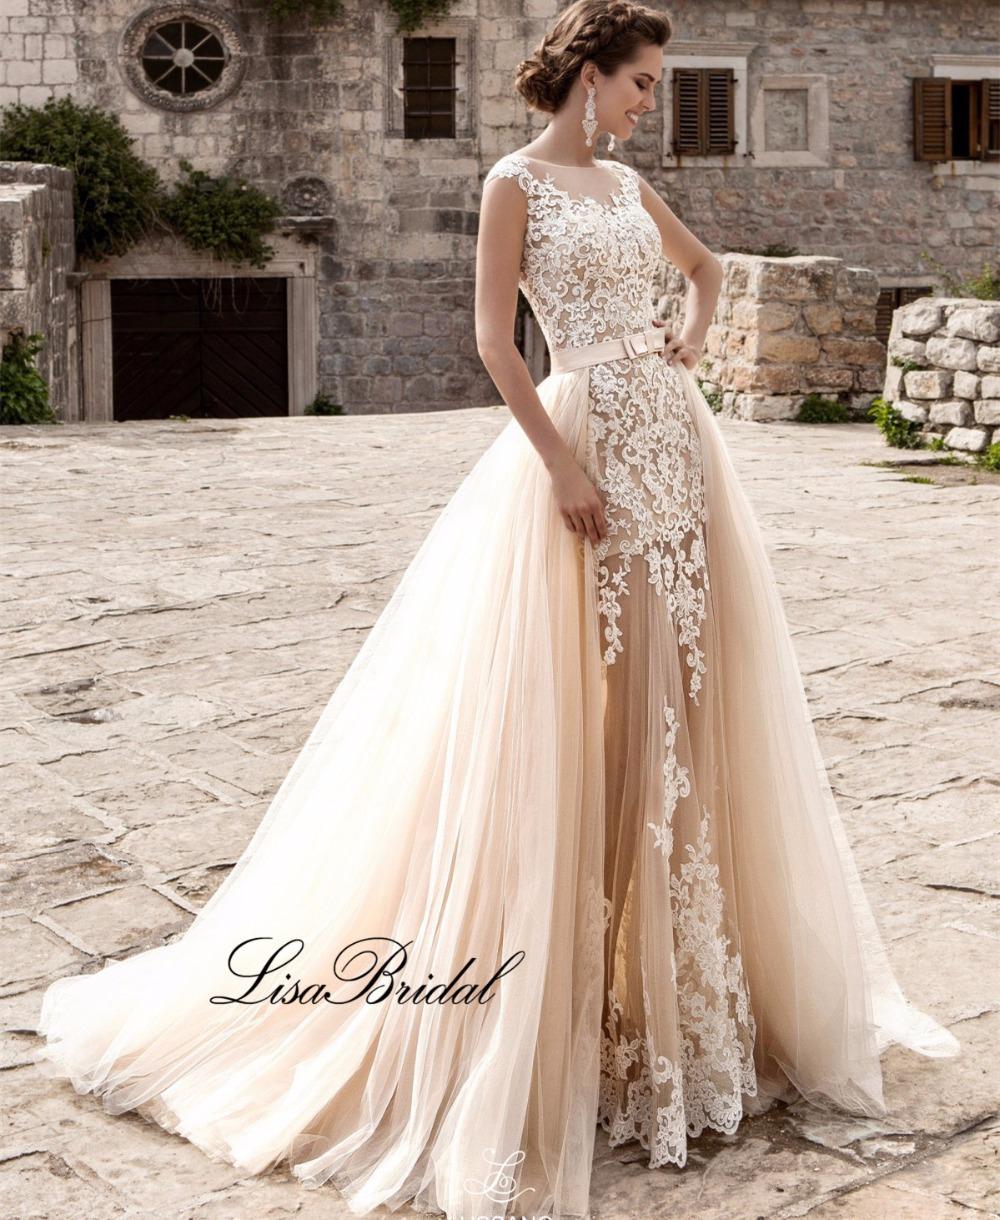 Buy vintage wedding dress online